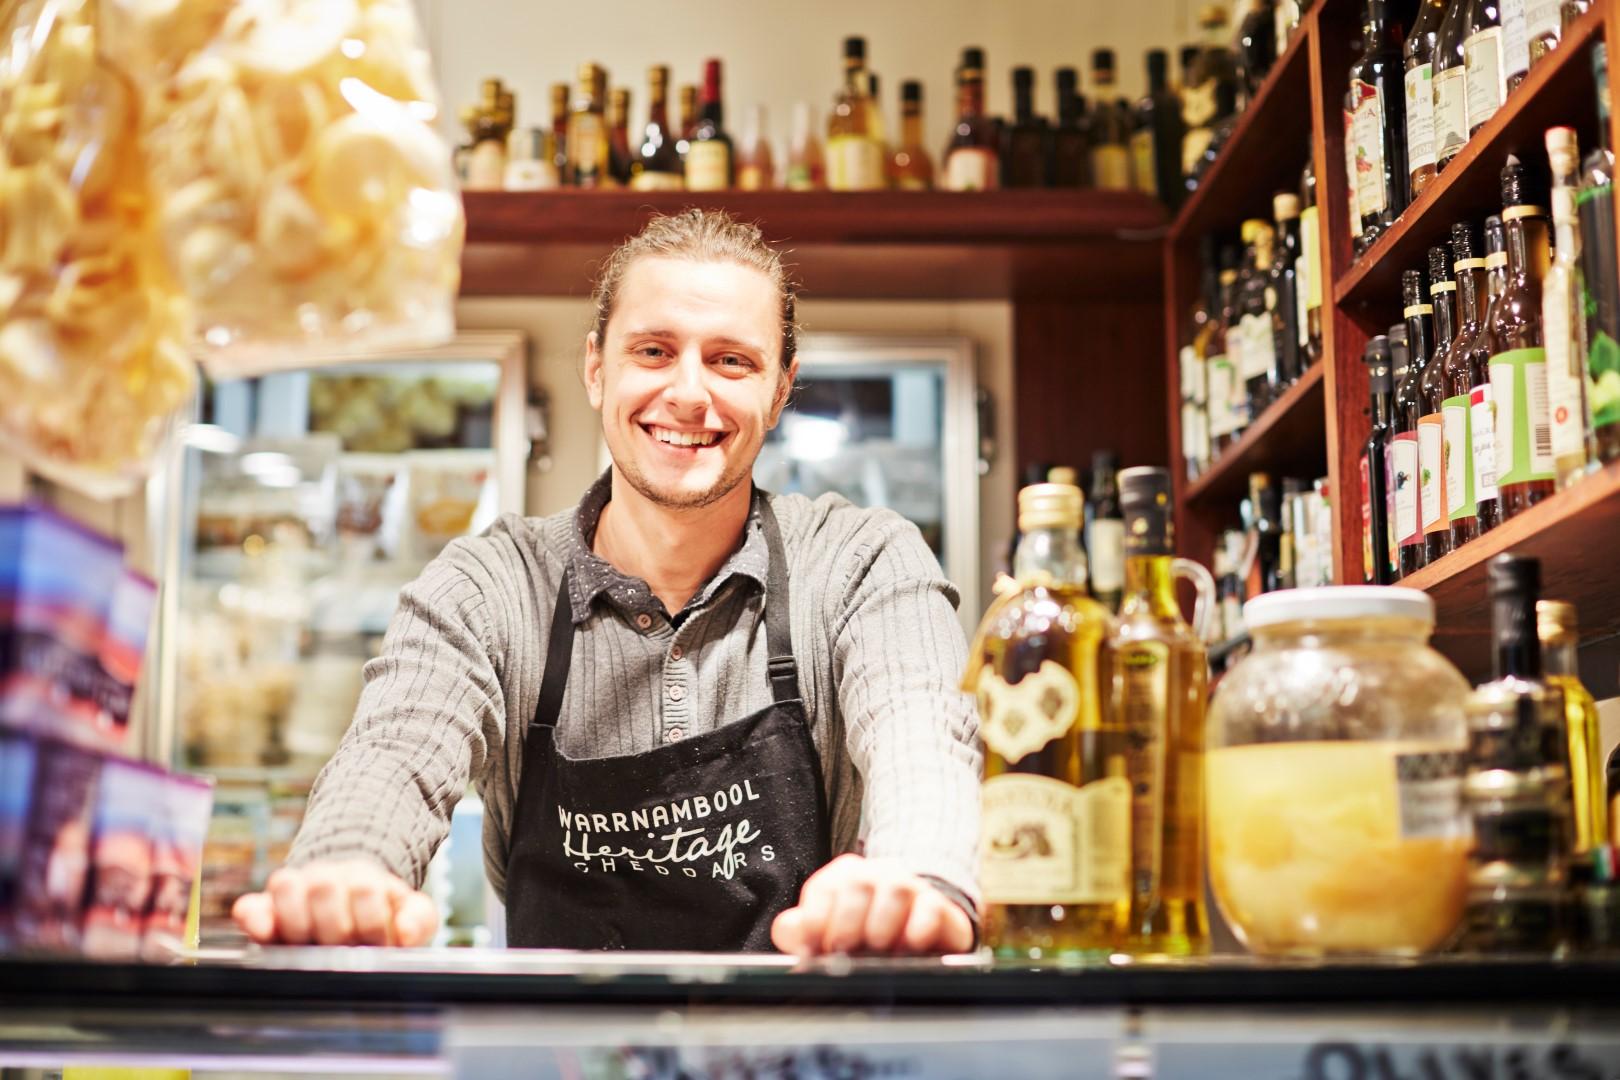 English In Italian: Queen Victoria Market All-day Guide